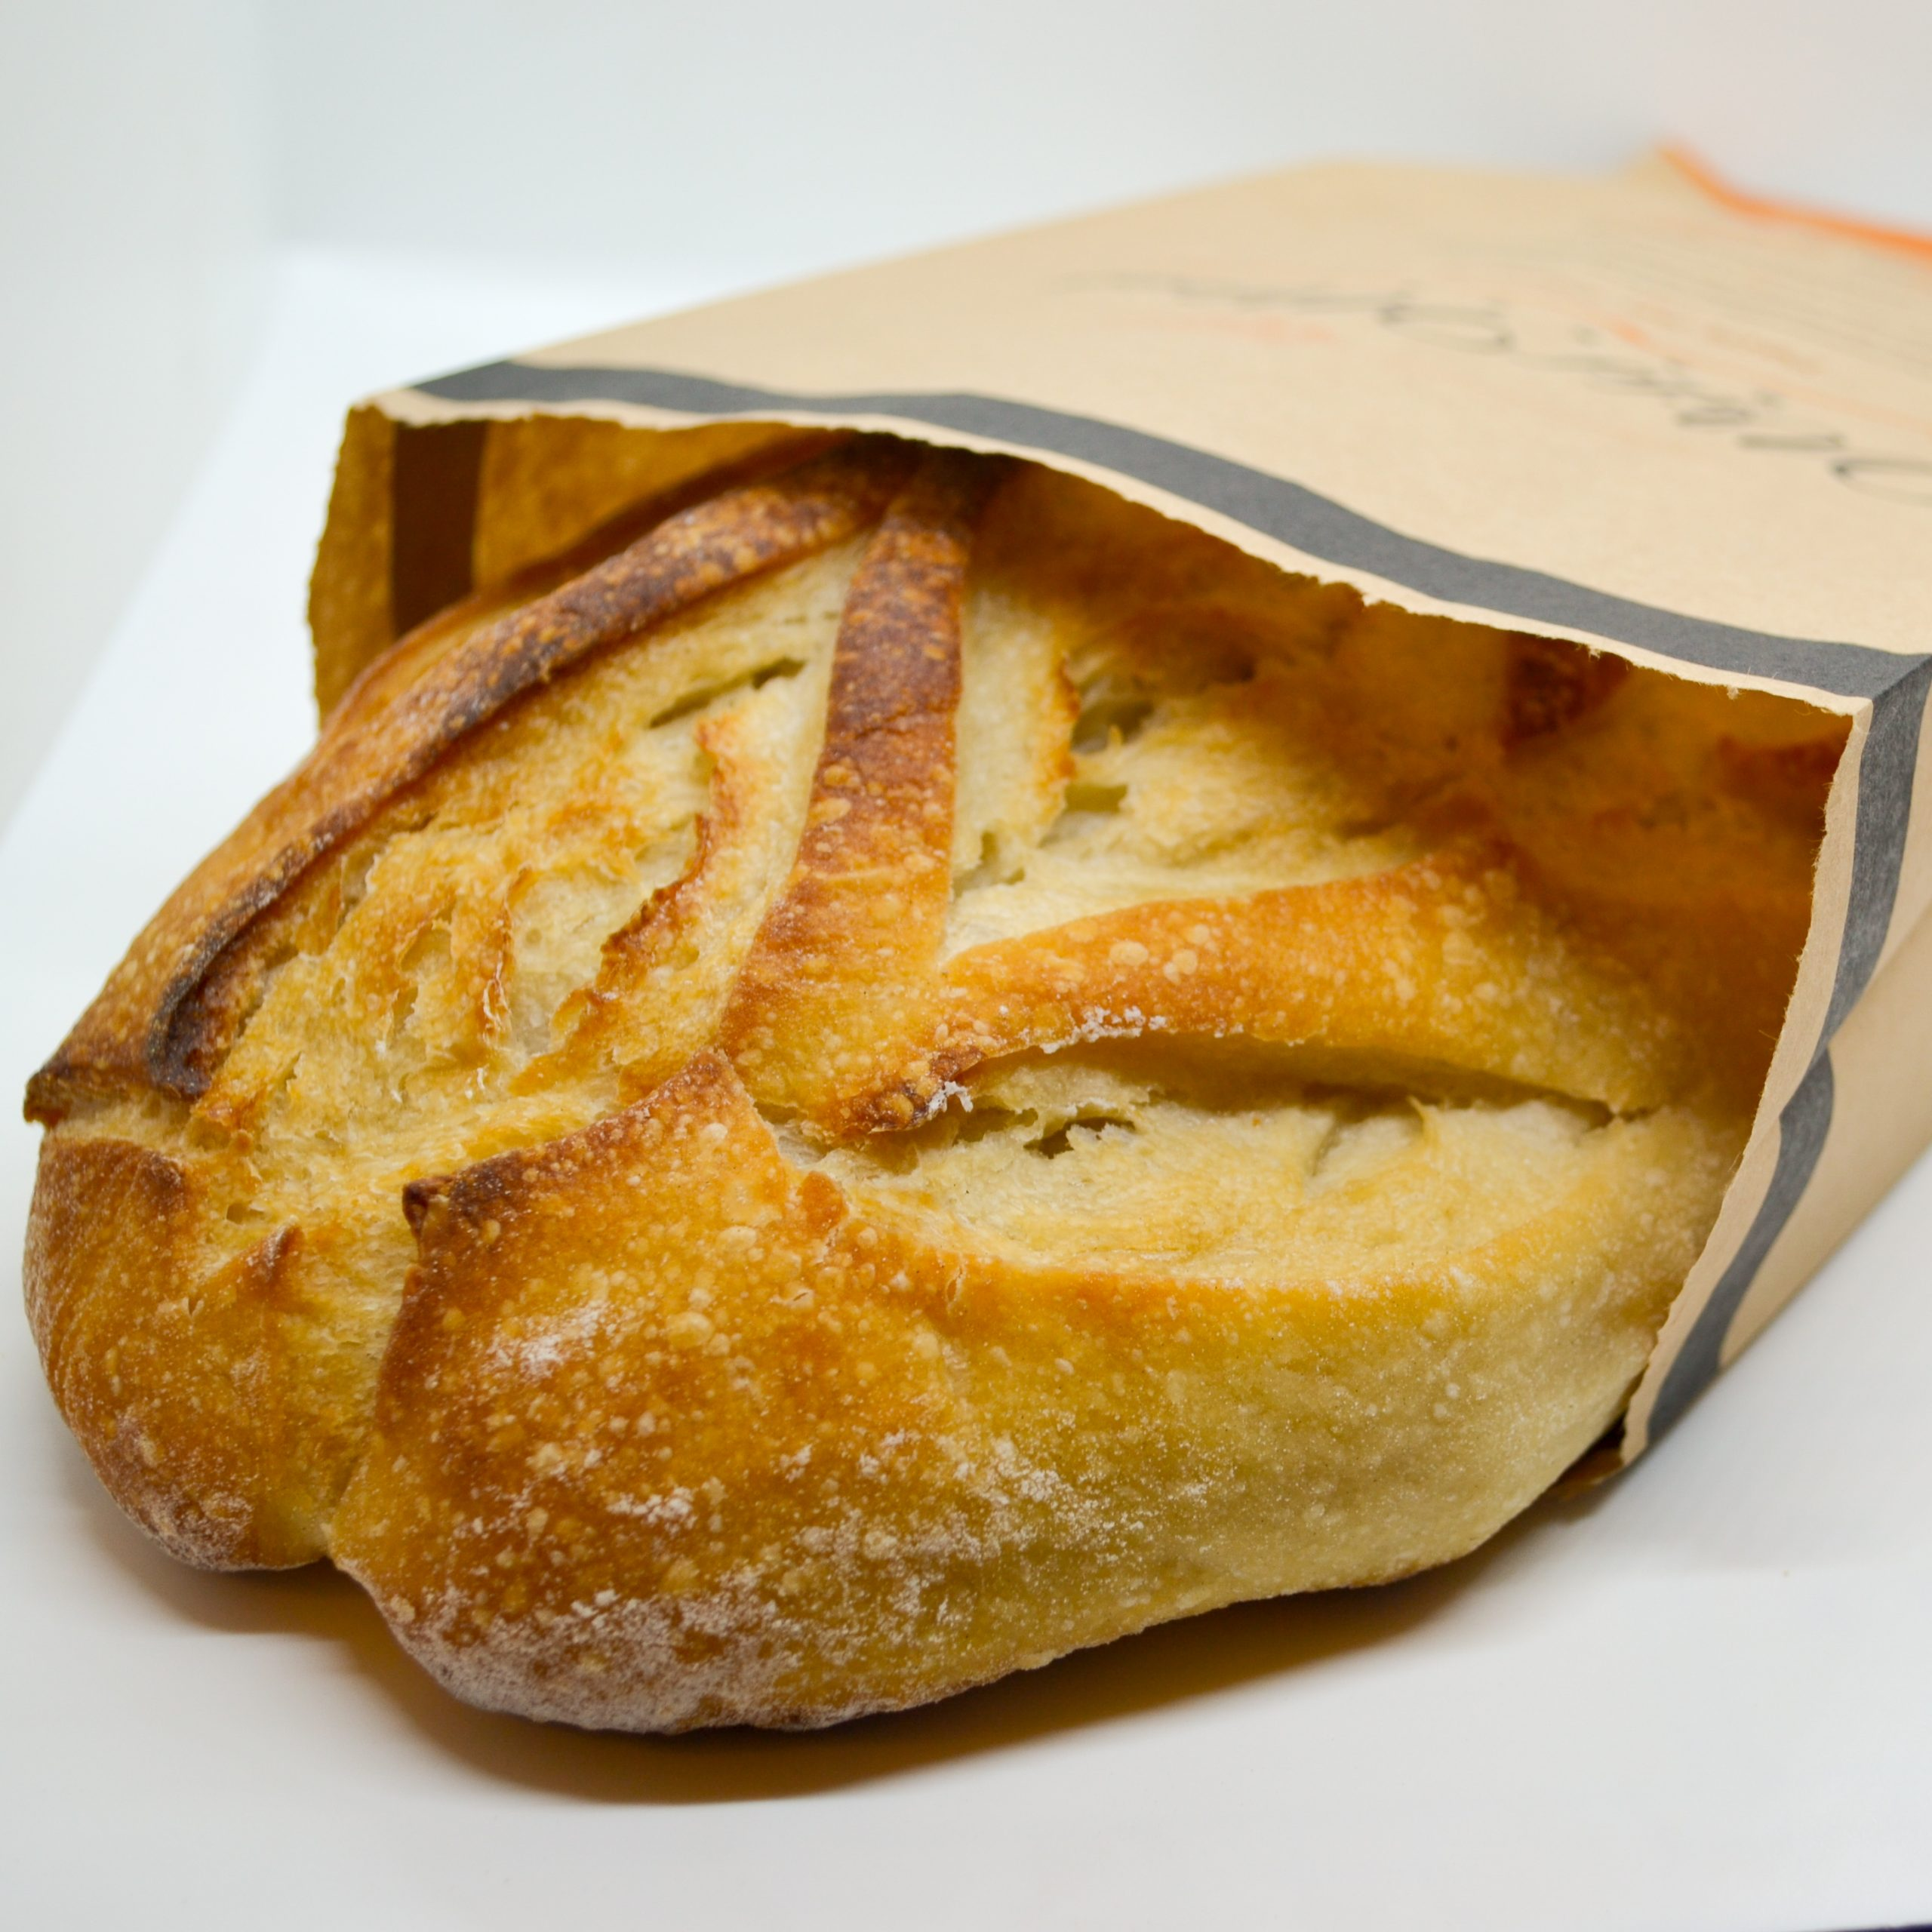 Wild Wheat Pain Au Levain bread